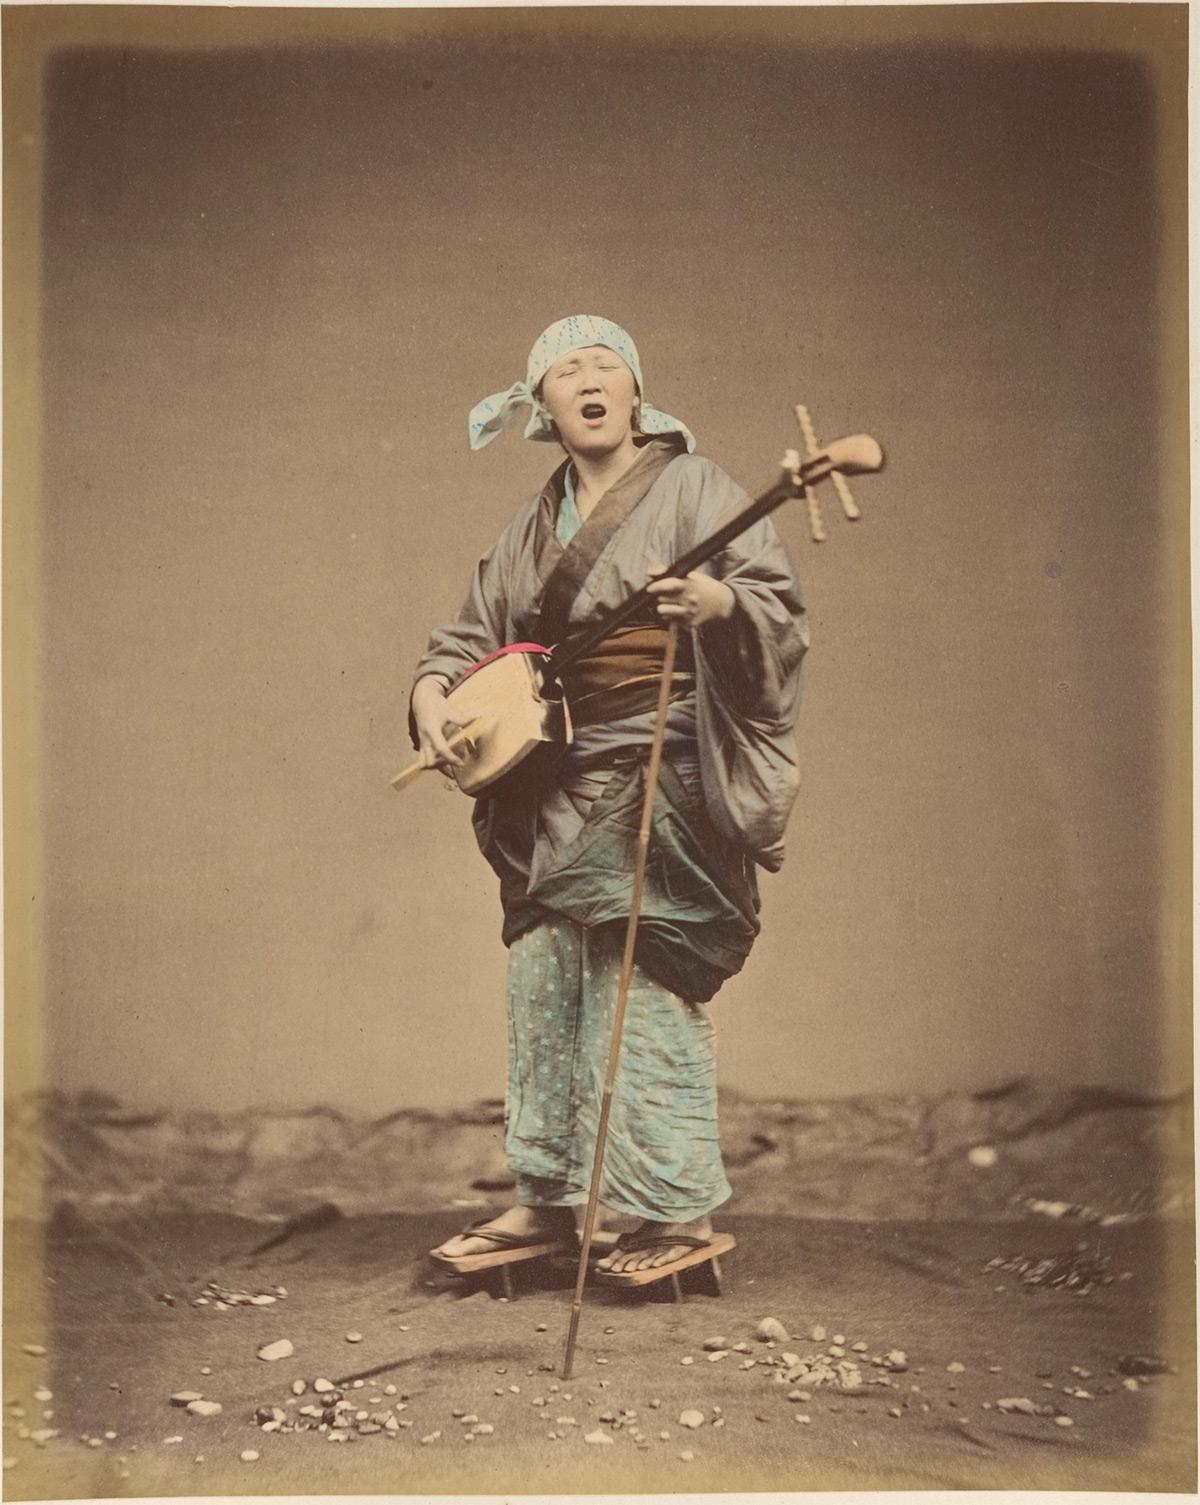 Street Minstrel, Gose / Shinichi Suzuki / 1870s (credit: Metropolitan Museum of Art)